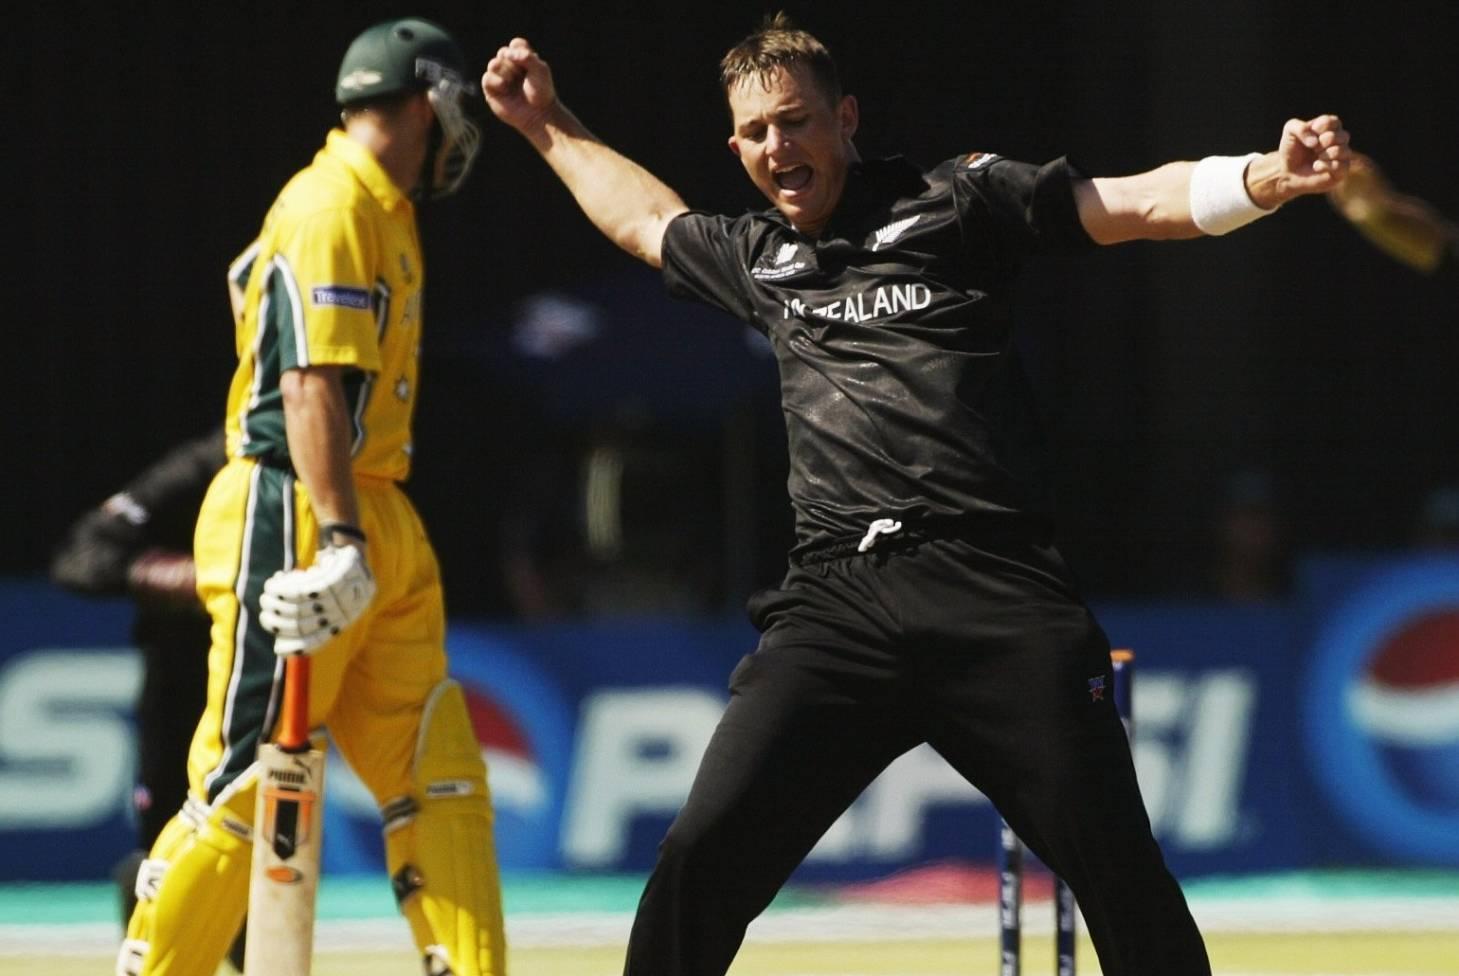 Cricket World Cup flashback: When Shane Bond destroyed Australia - again |  Stuff.co.nz